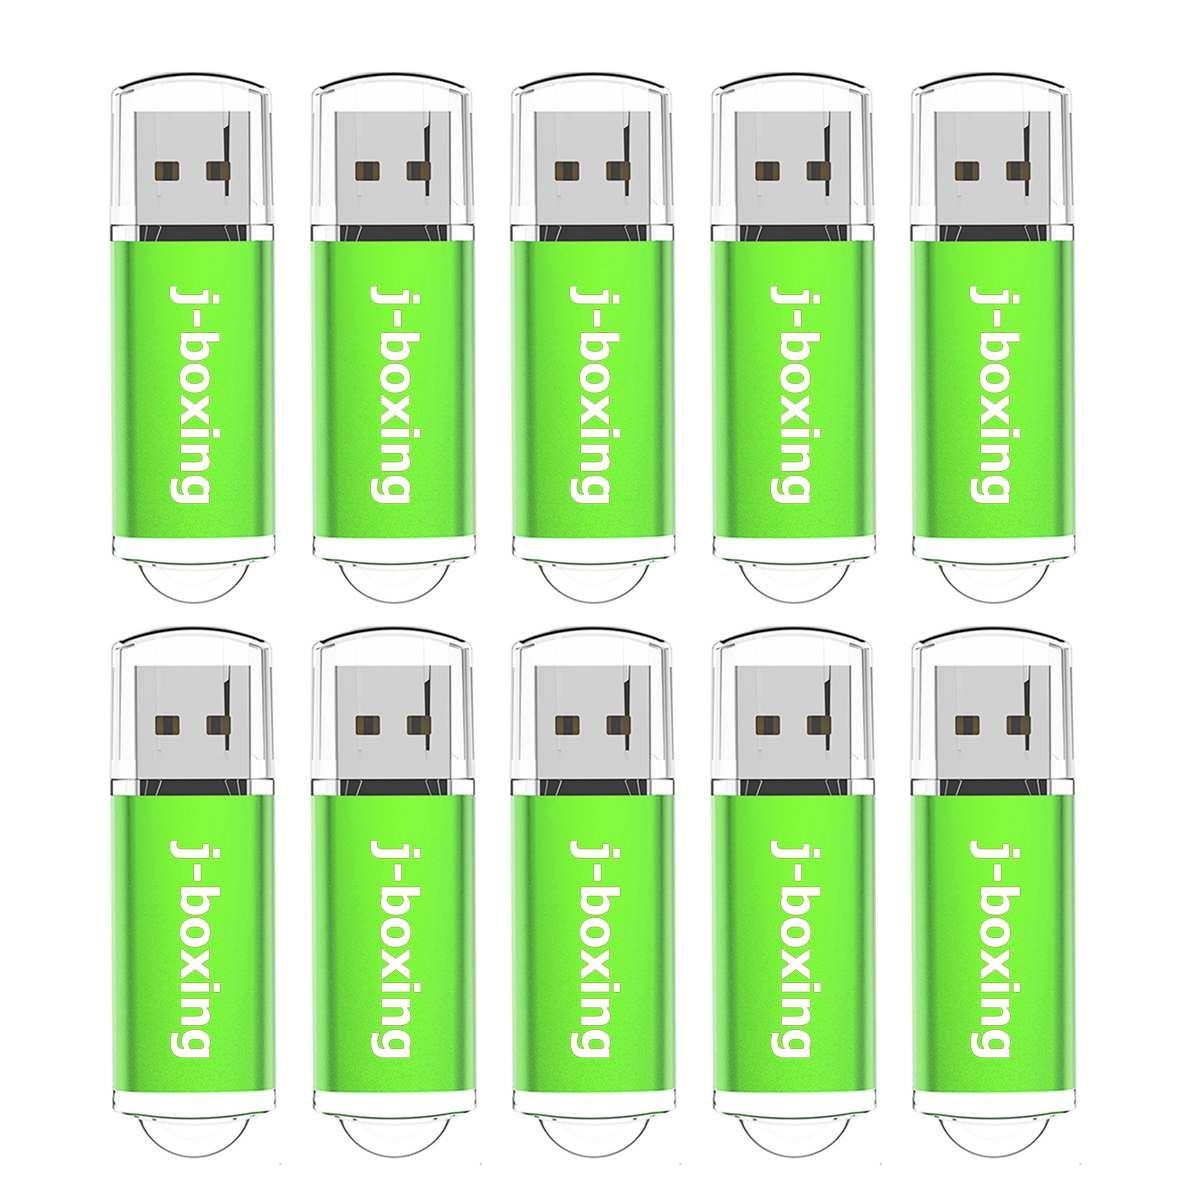 Green 10PCS Rectangle USB 2.0 Flash Drives Enough Pen Drives Thumb Memory Stick Storage 64M 128M 256M 512M 1G 2G 4G 8G 16G 32G for PC Laptop